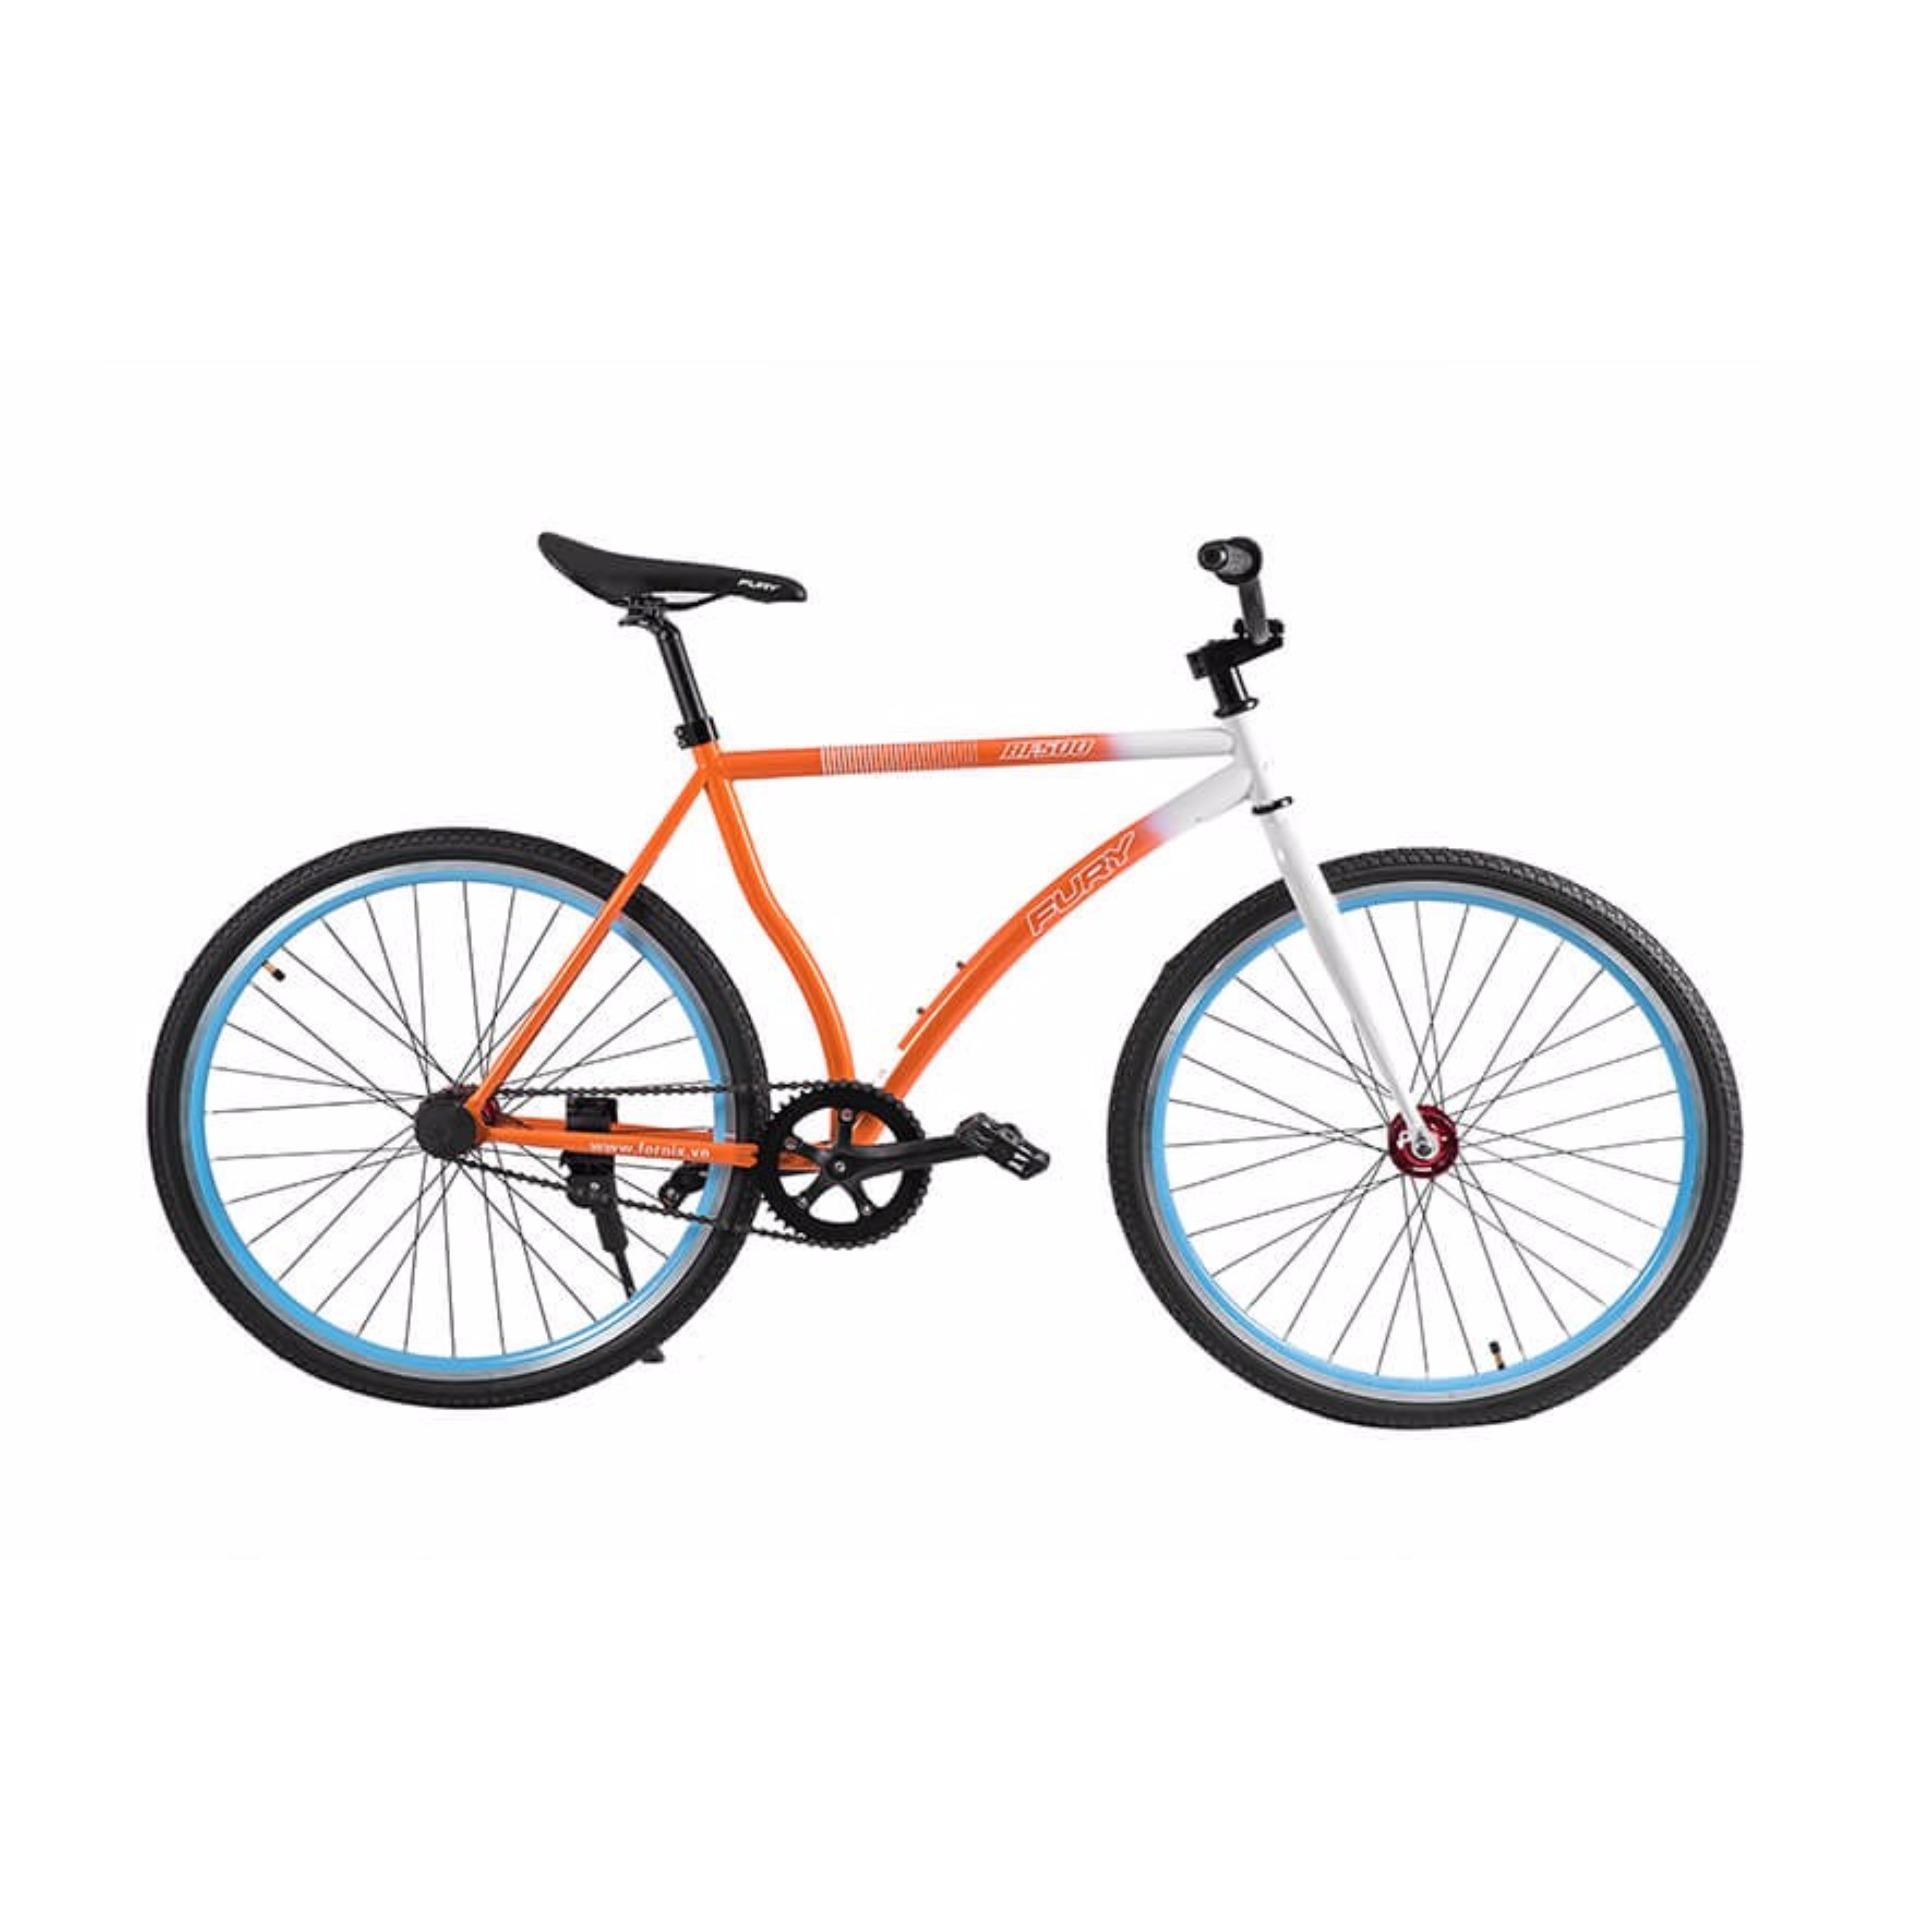 Xe đạp FixedGear, hiệu FURY, mã BF500 ( cam )